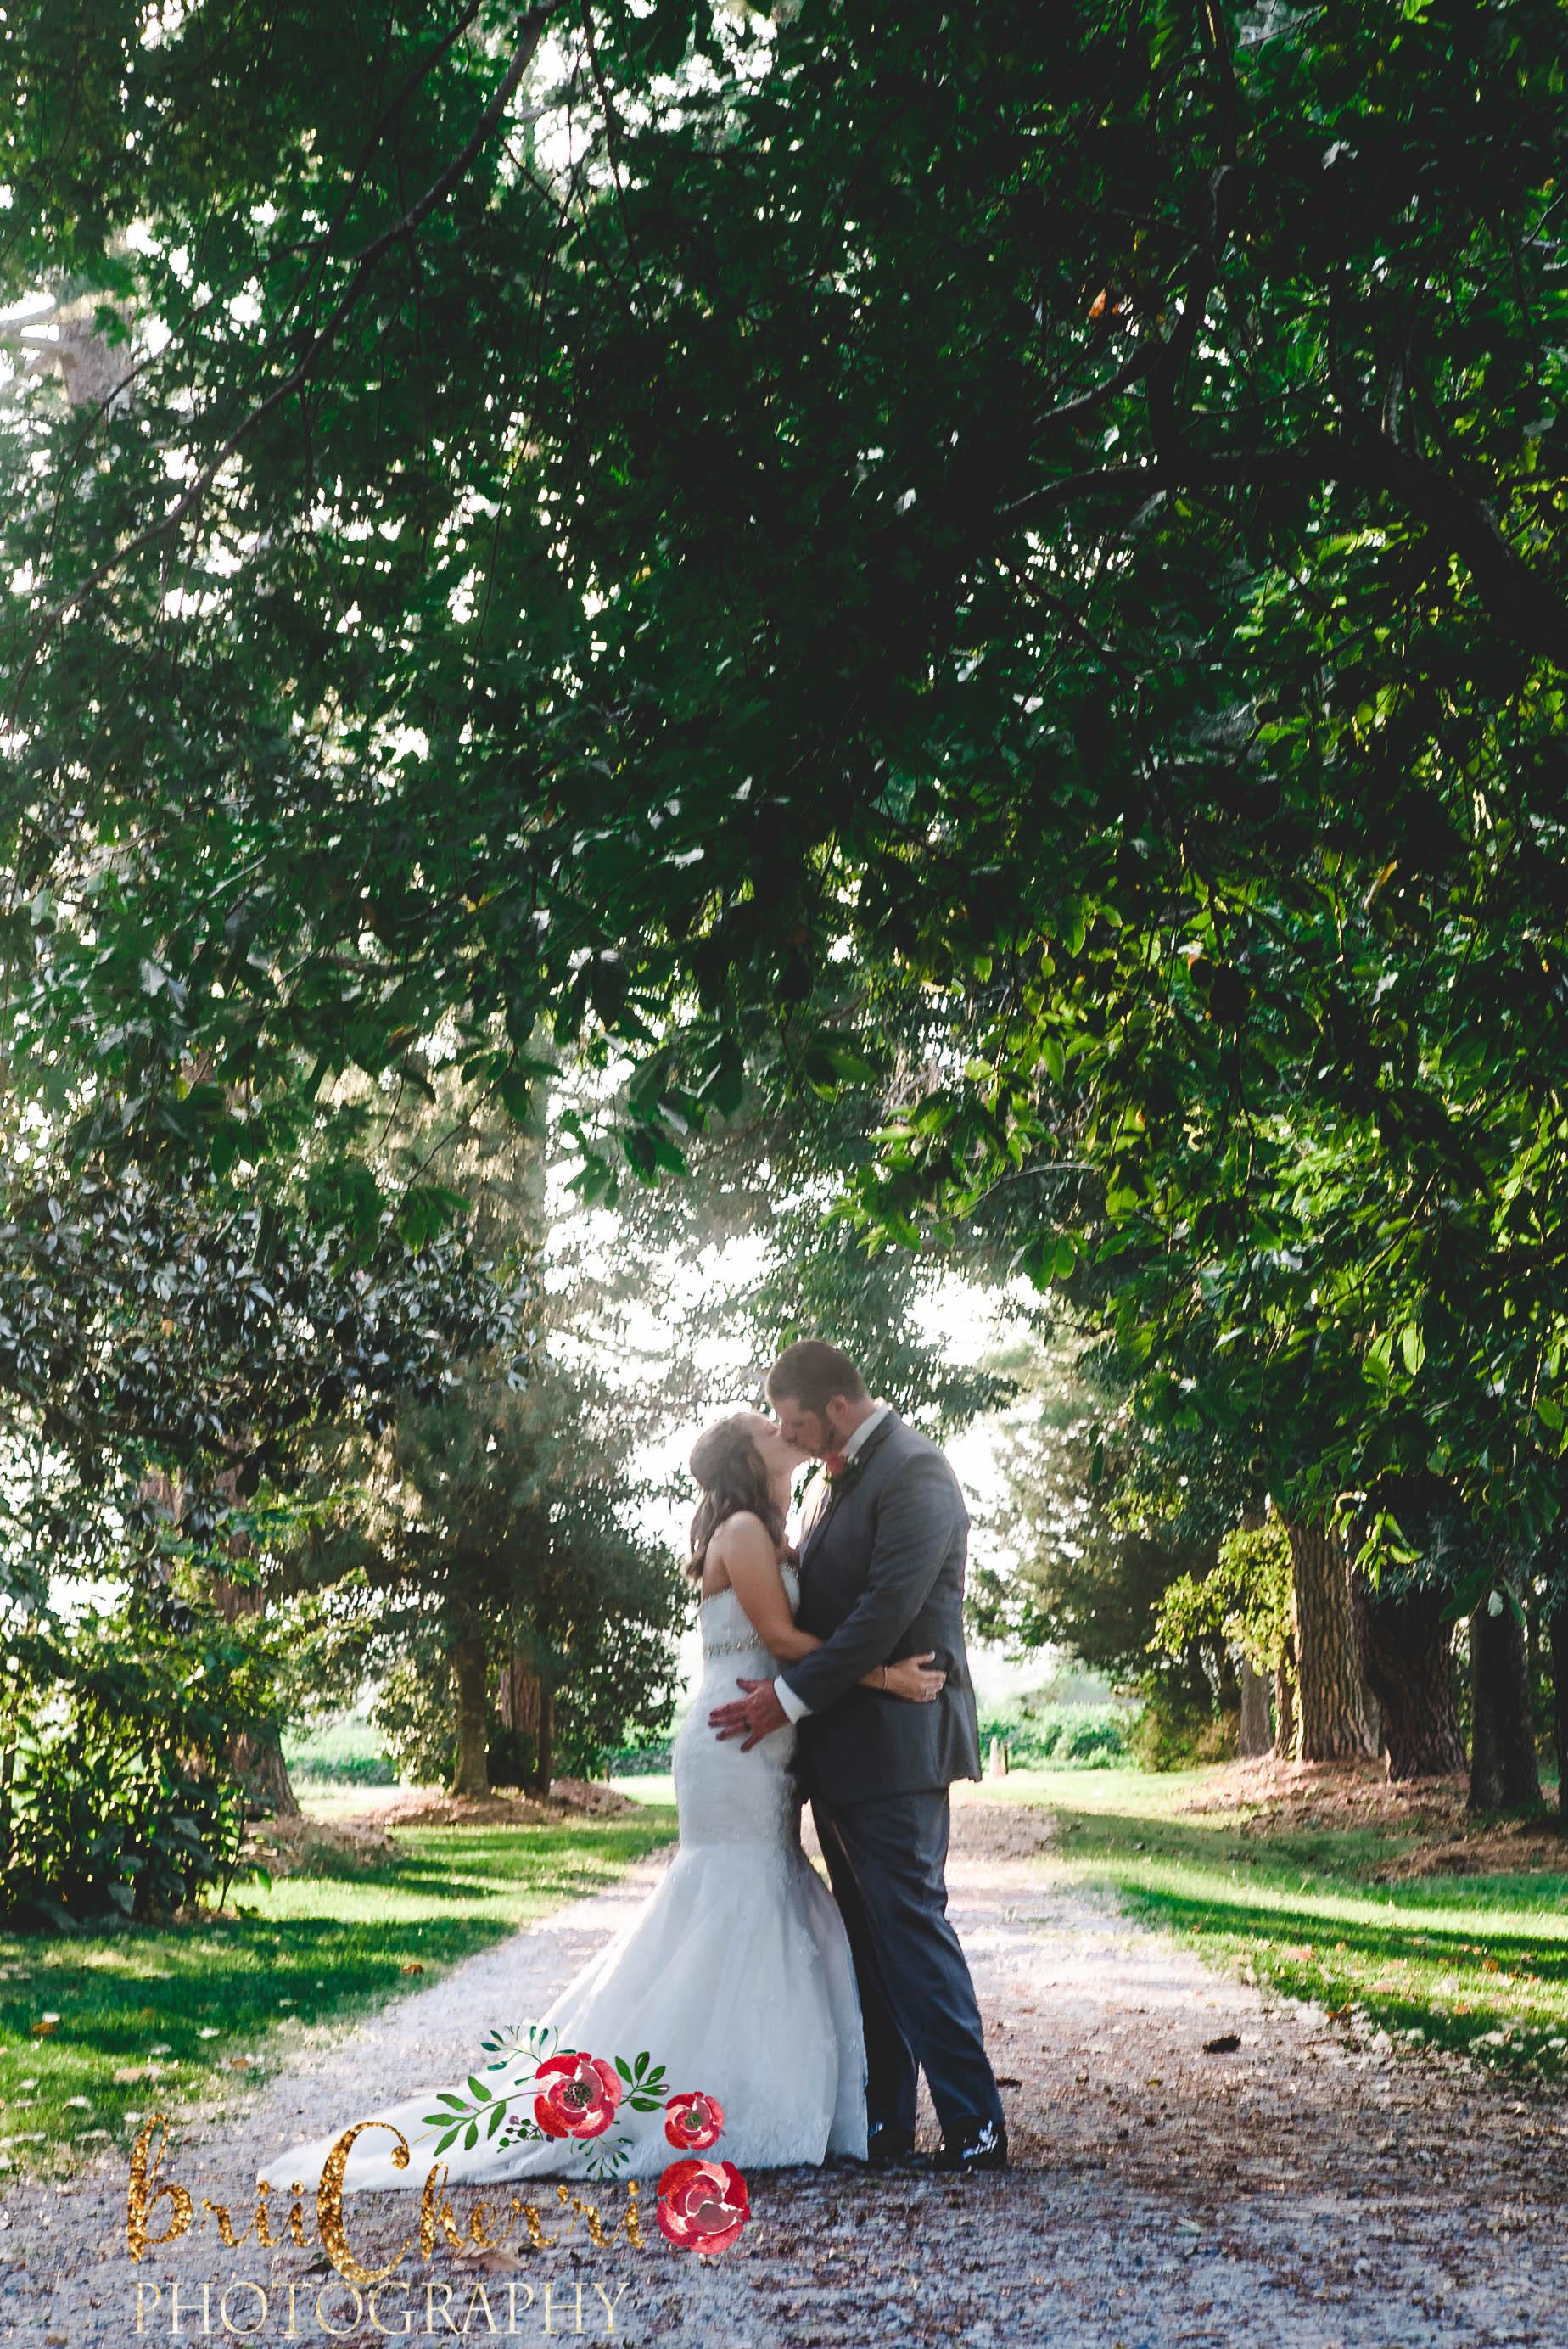 LongStraw Farms Wedding venue Greenville nc wedding photographer